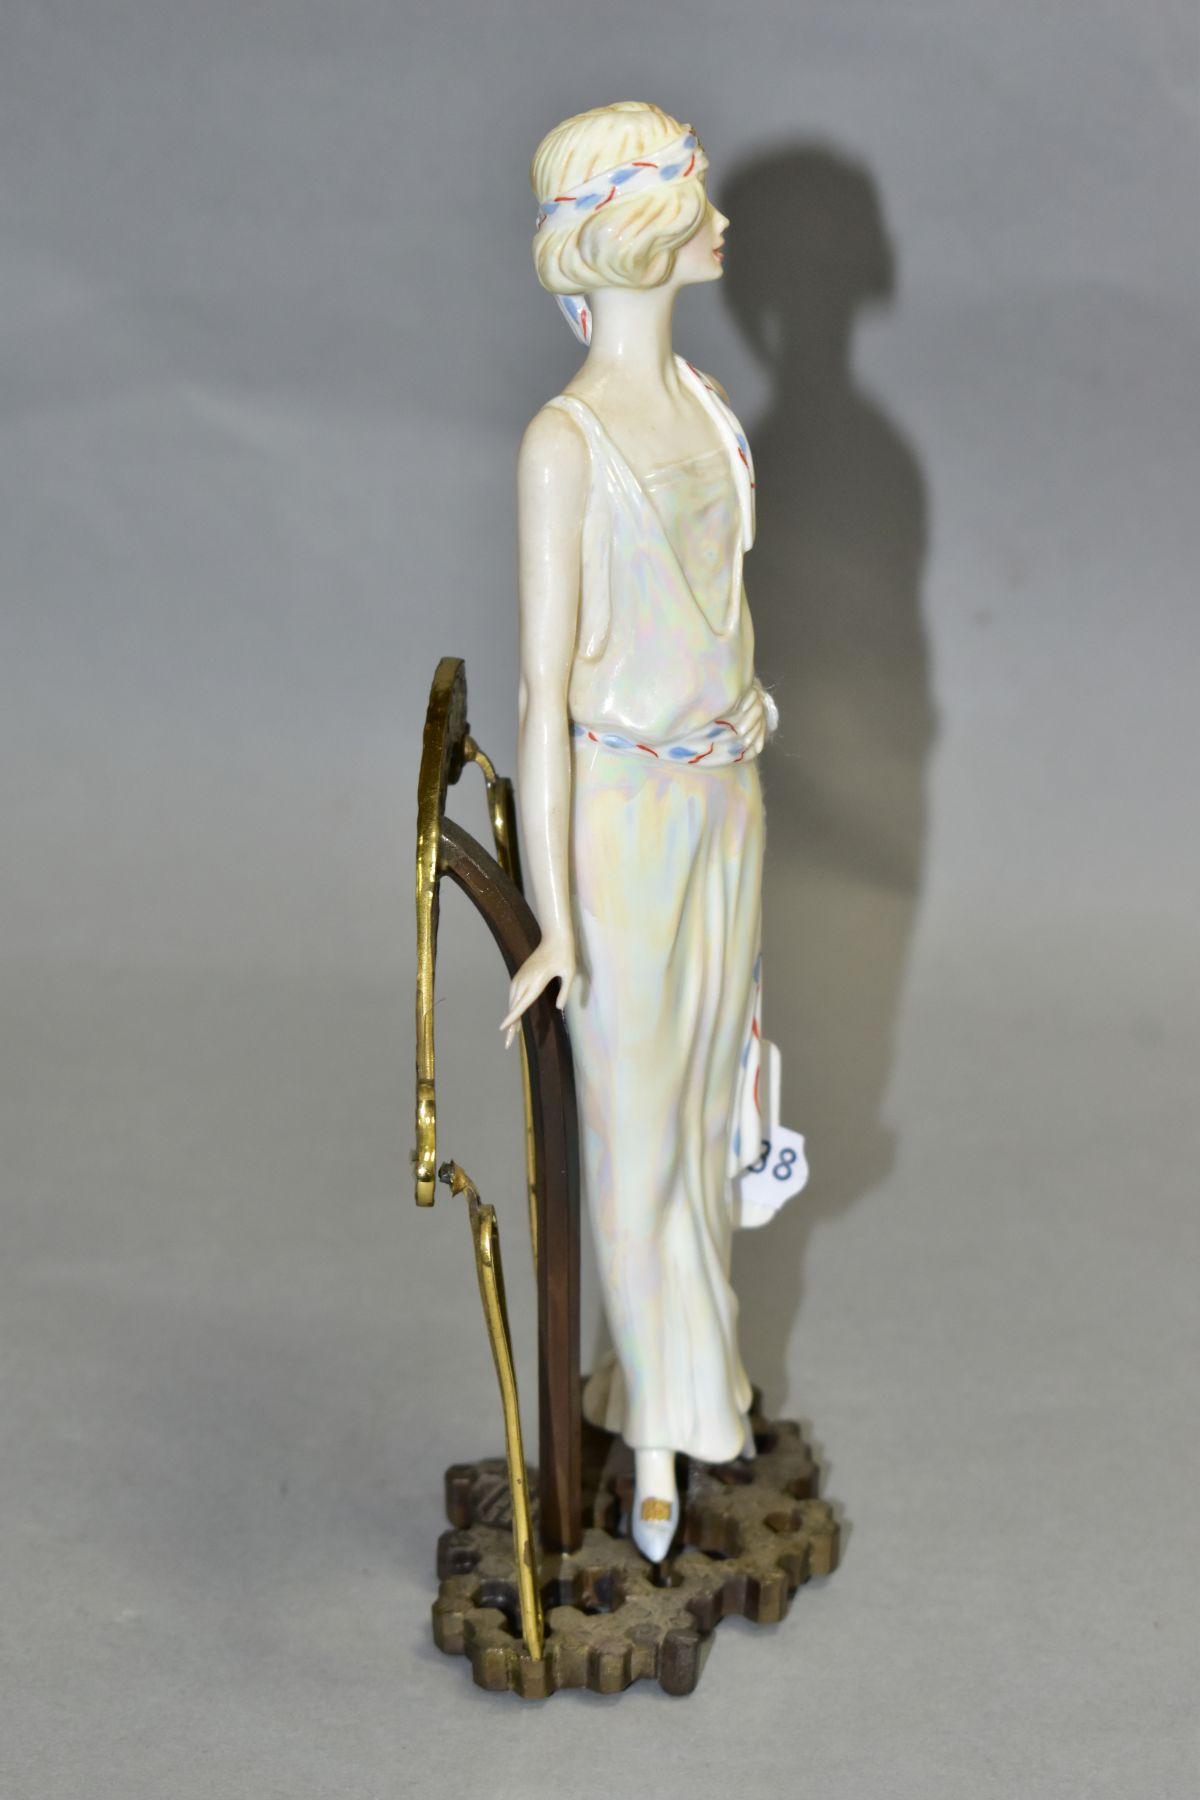 AN ALBANY BONE CHINA AND BRONZED 1920's FIGURINE, 'Waldorf', impressed mark to base, height 20cm ( - Image 2 of 6